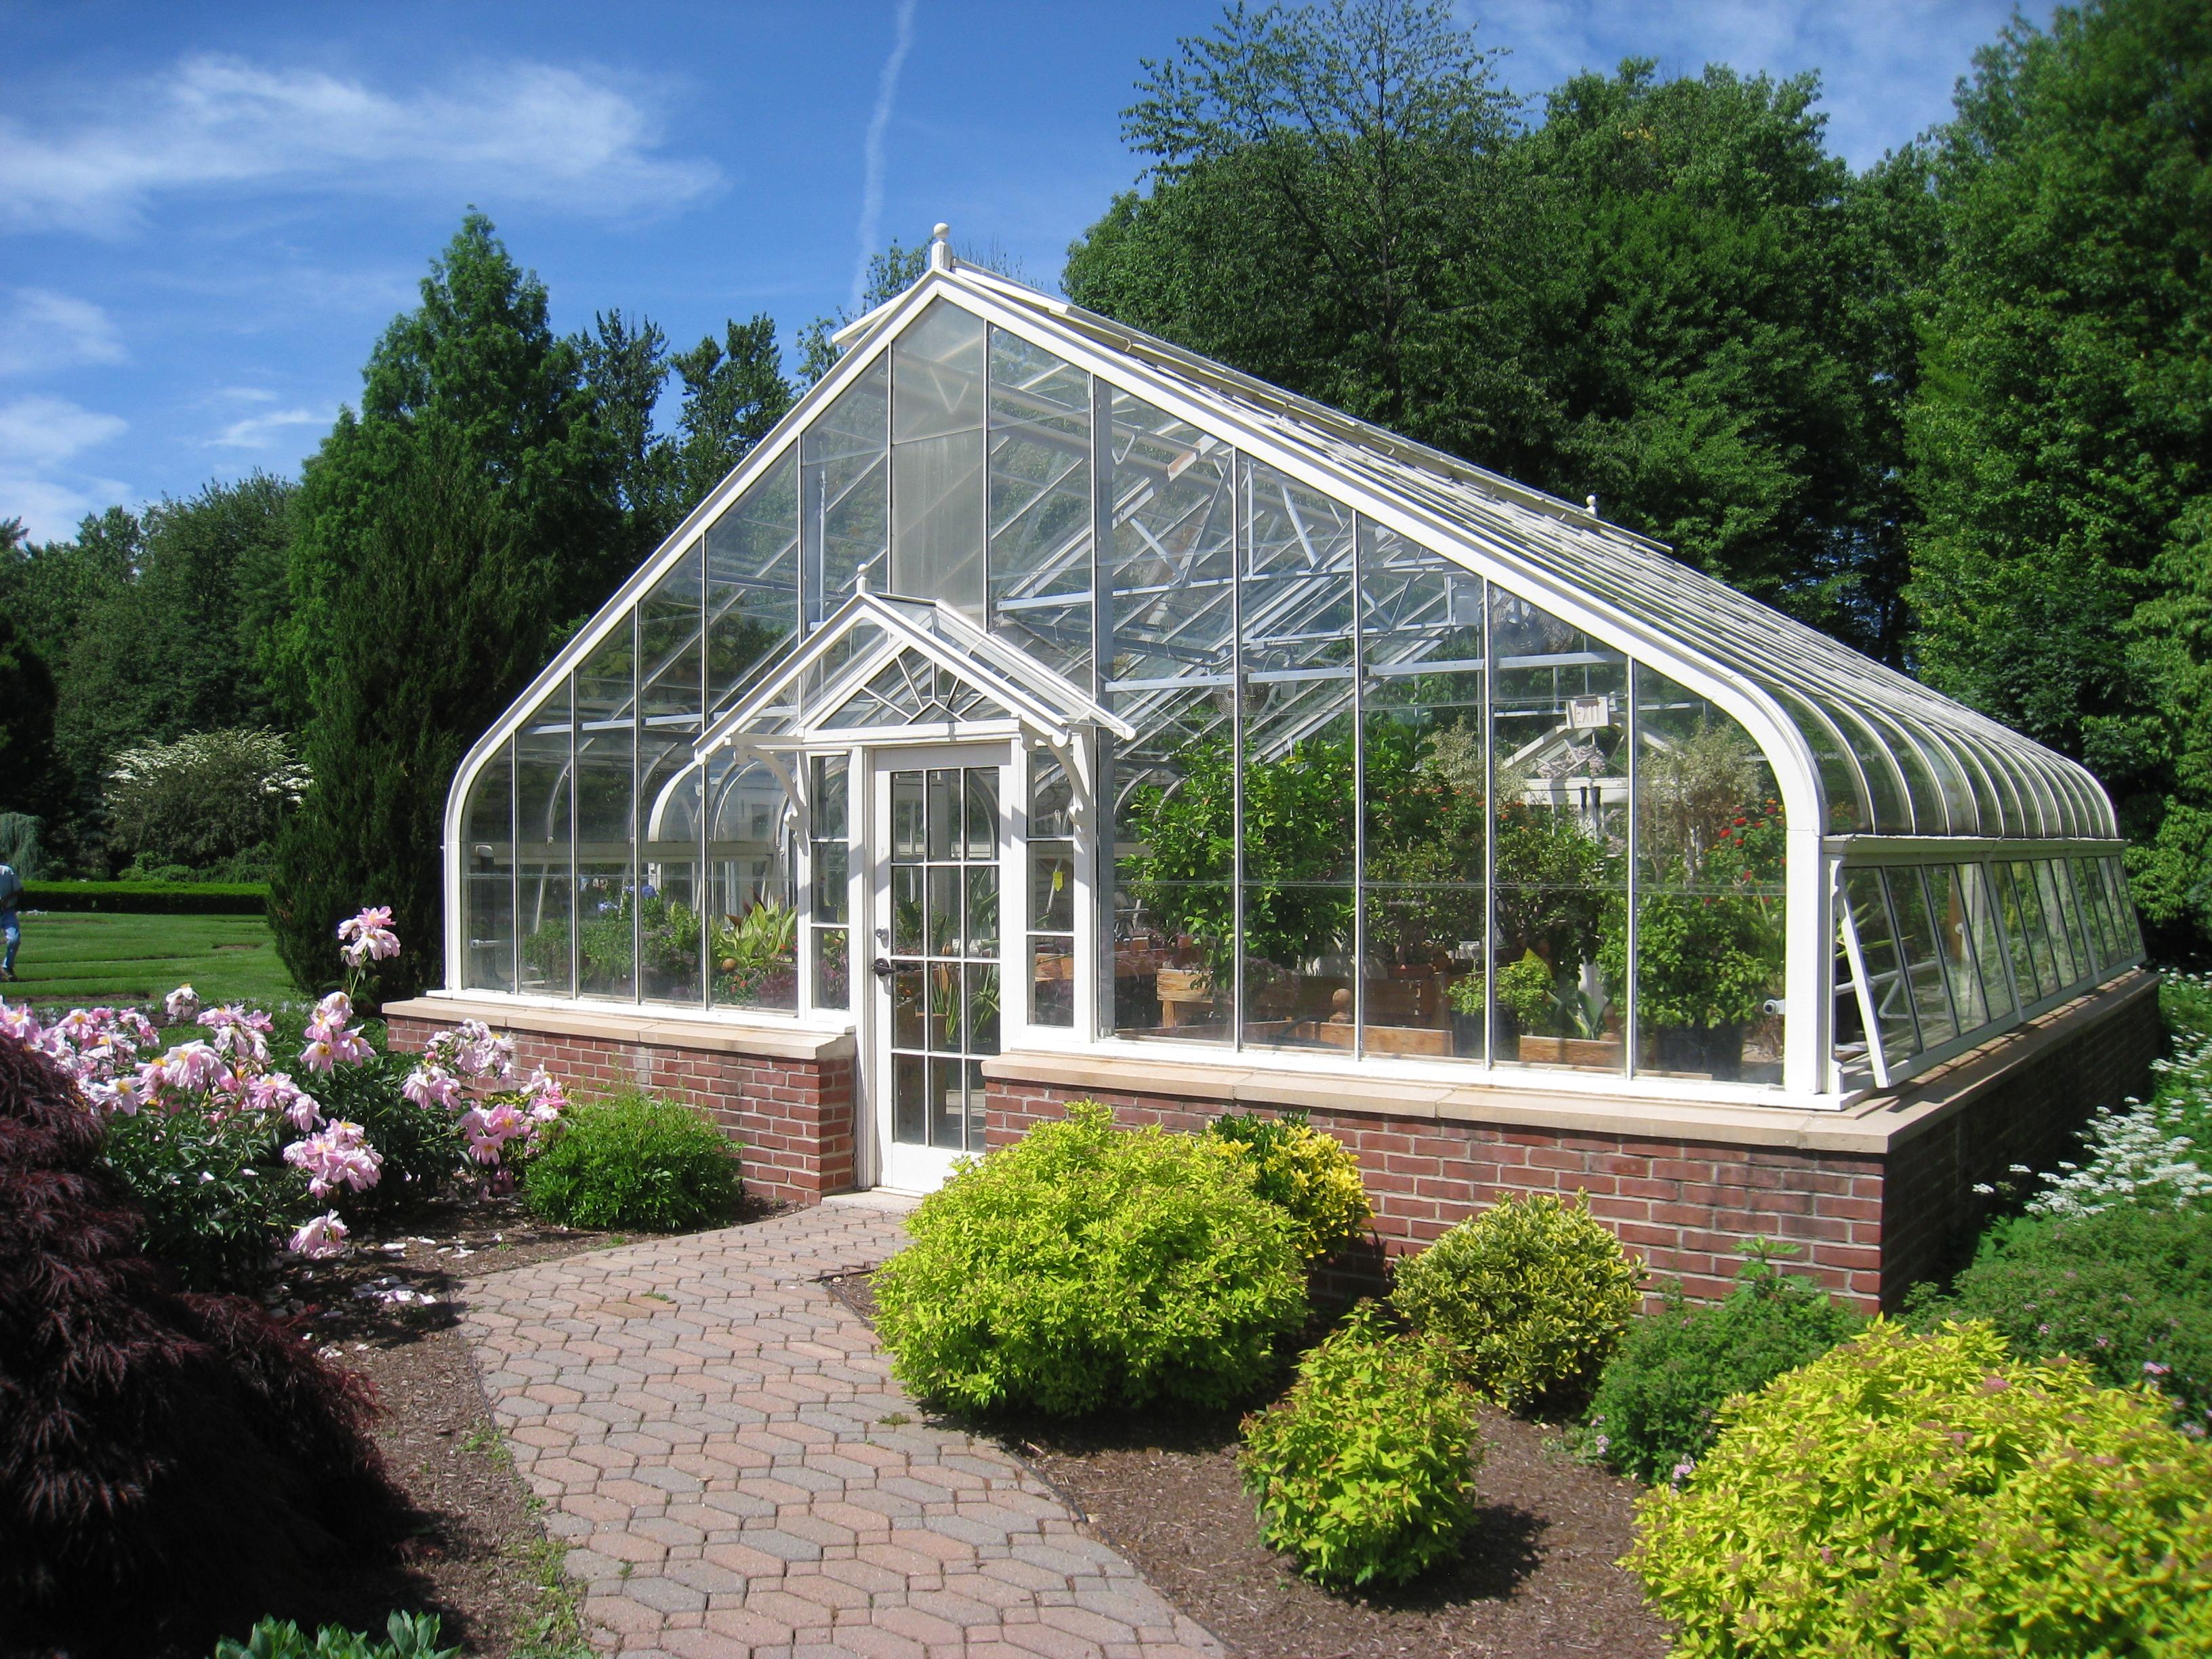 Superior File:Elizabeth Park, Hartford, CT   Greenhouses 2